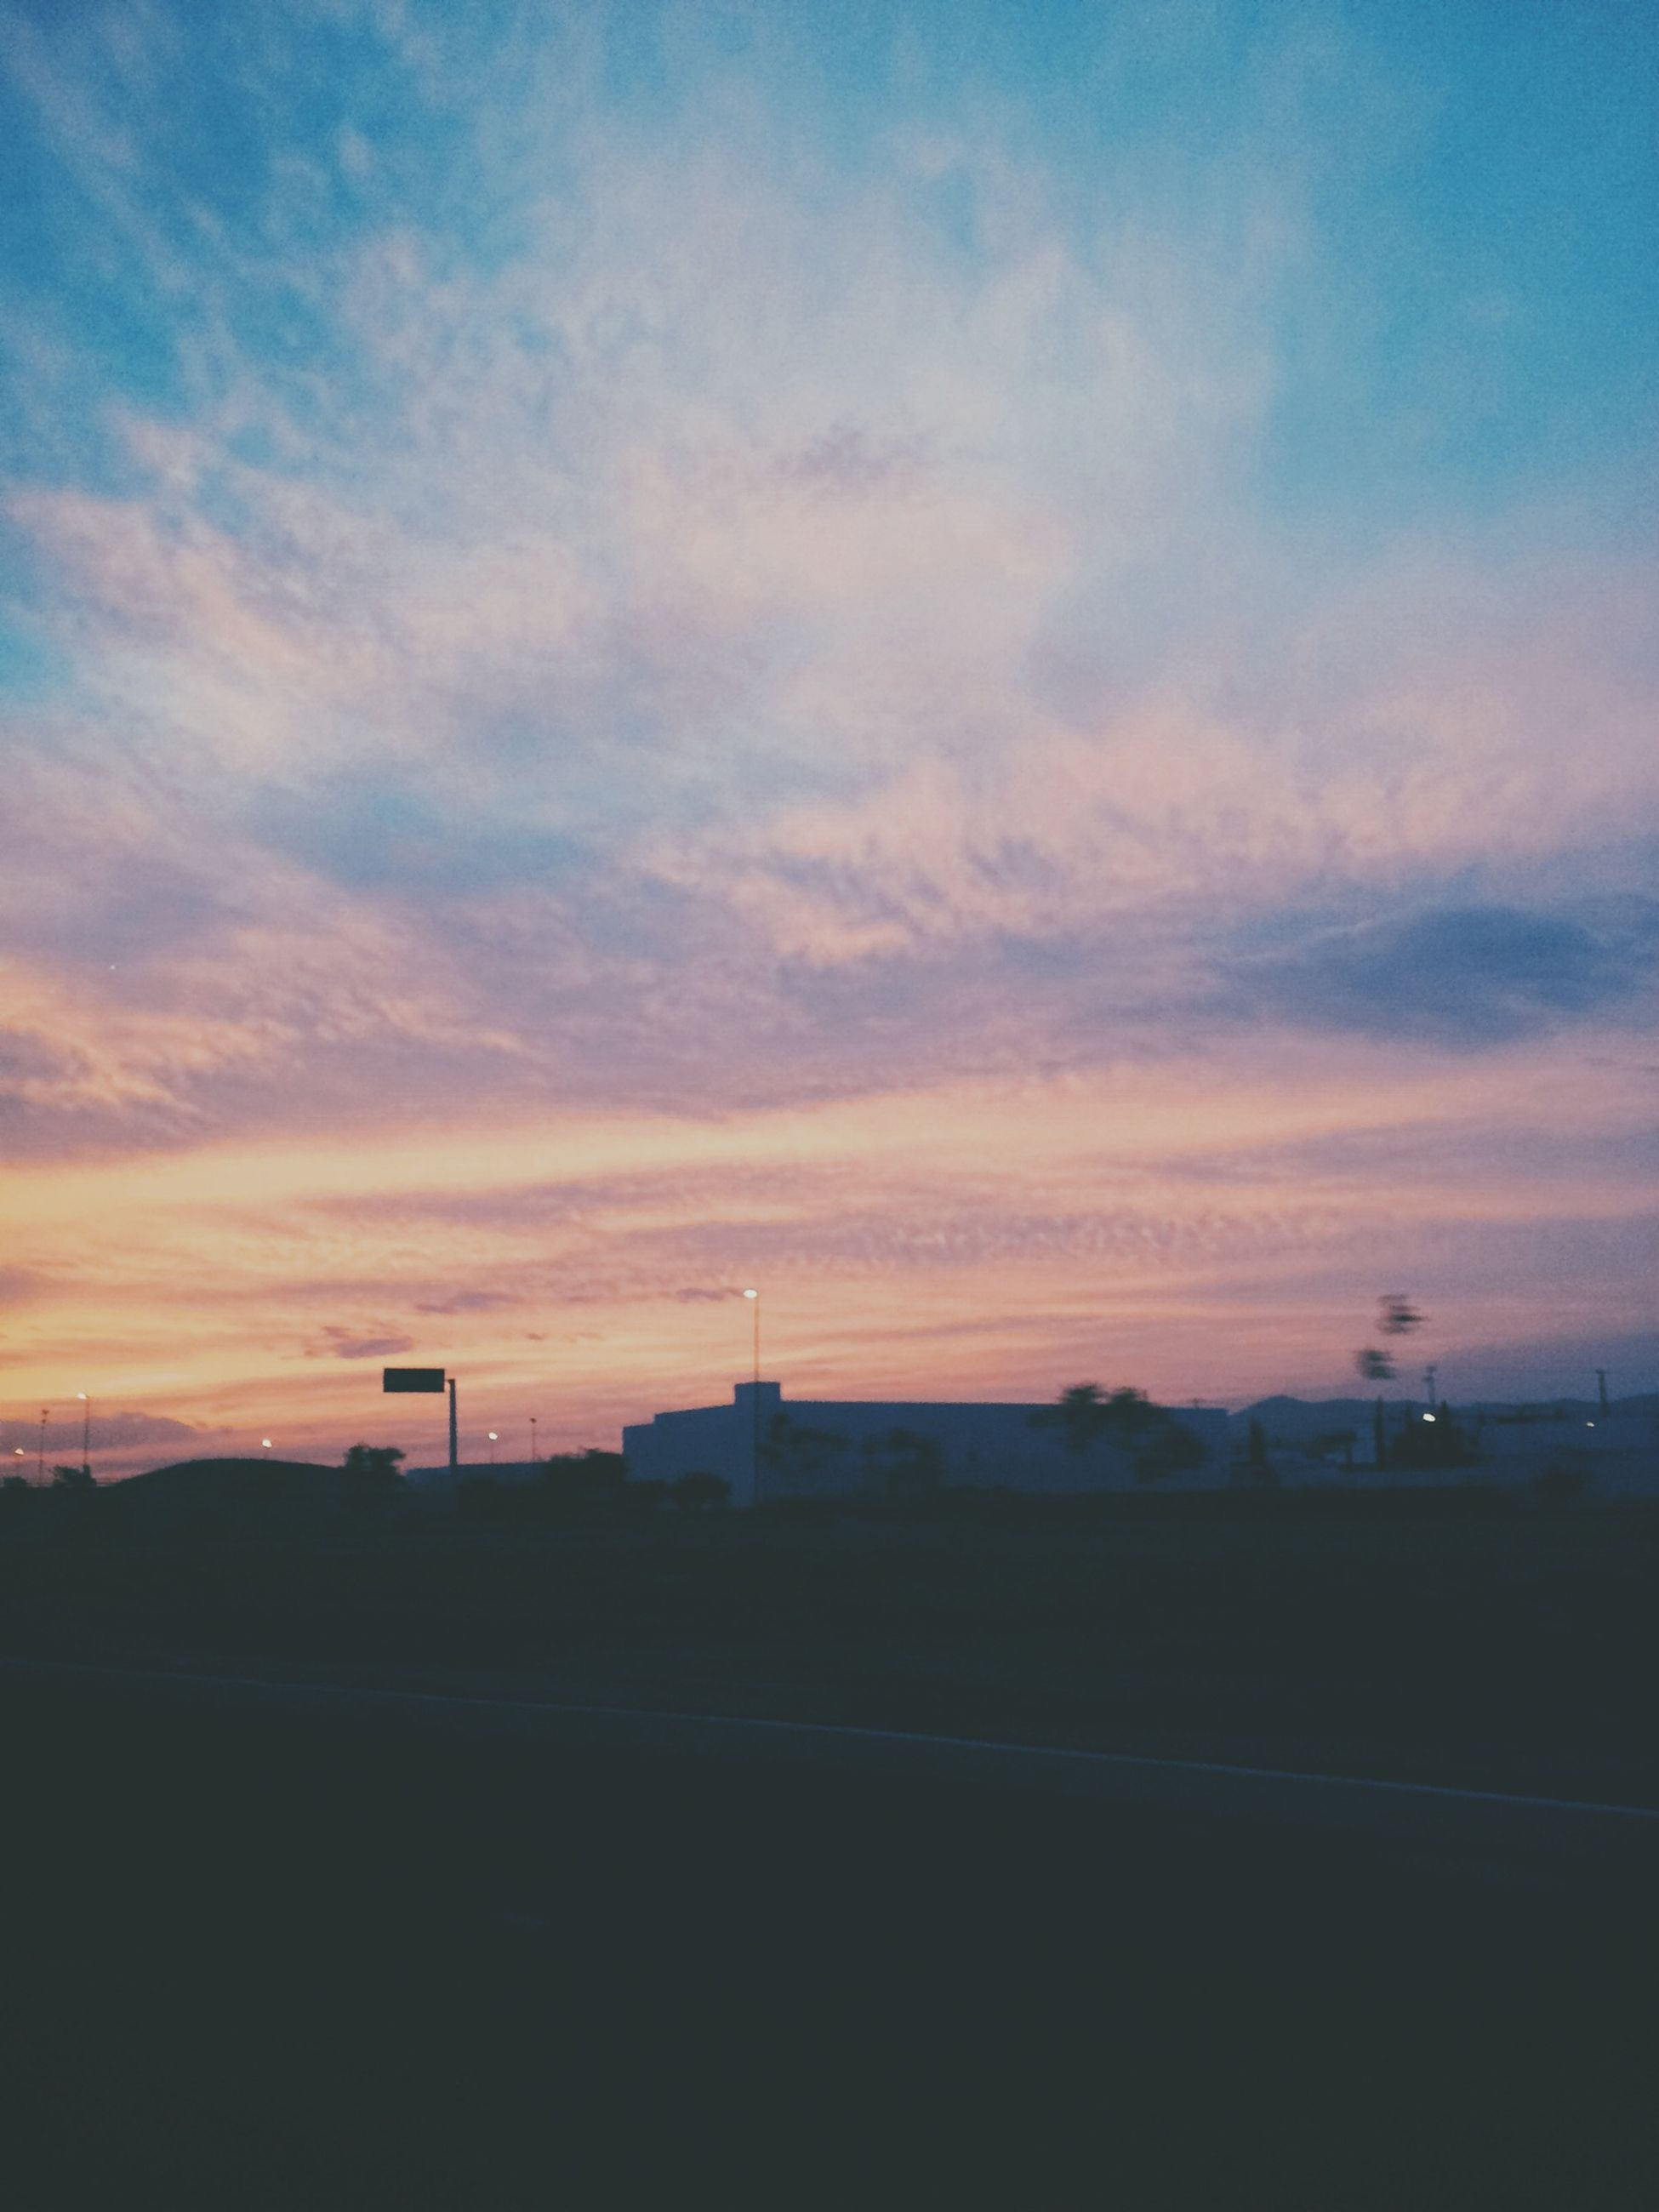 sunset, sky, silhouette, cloud - sky, building exterior, architecture, built structure, orange color, scenics, beauty in nature, dusk, cloud, landscape, tranquility, transportation, nature, tranquil scene, cloudy, outdoors, road